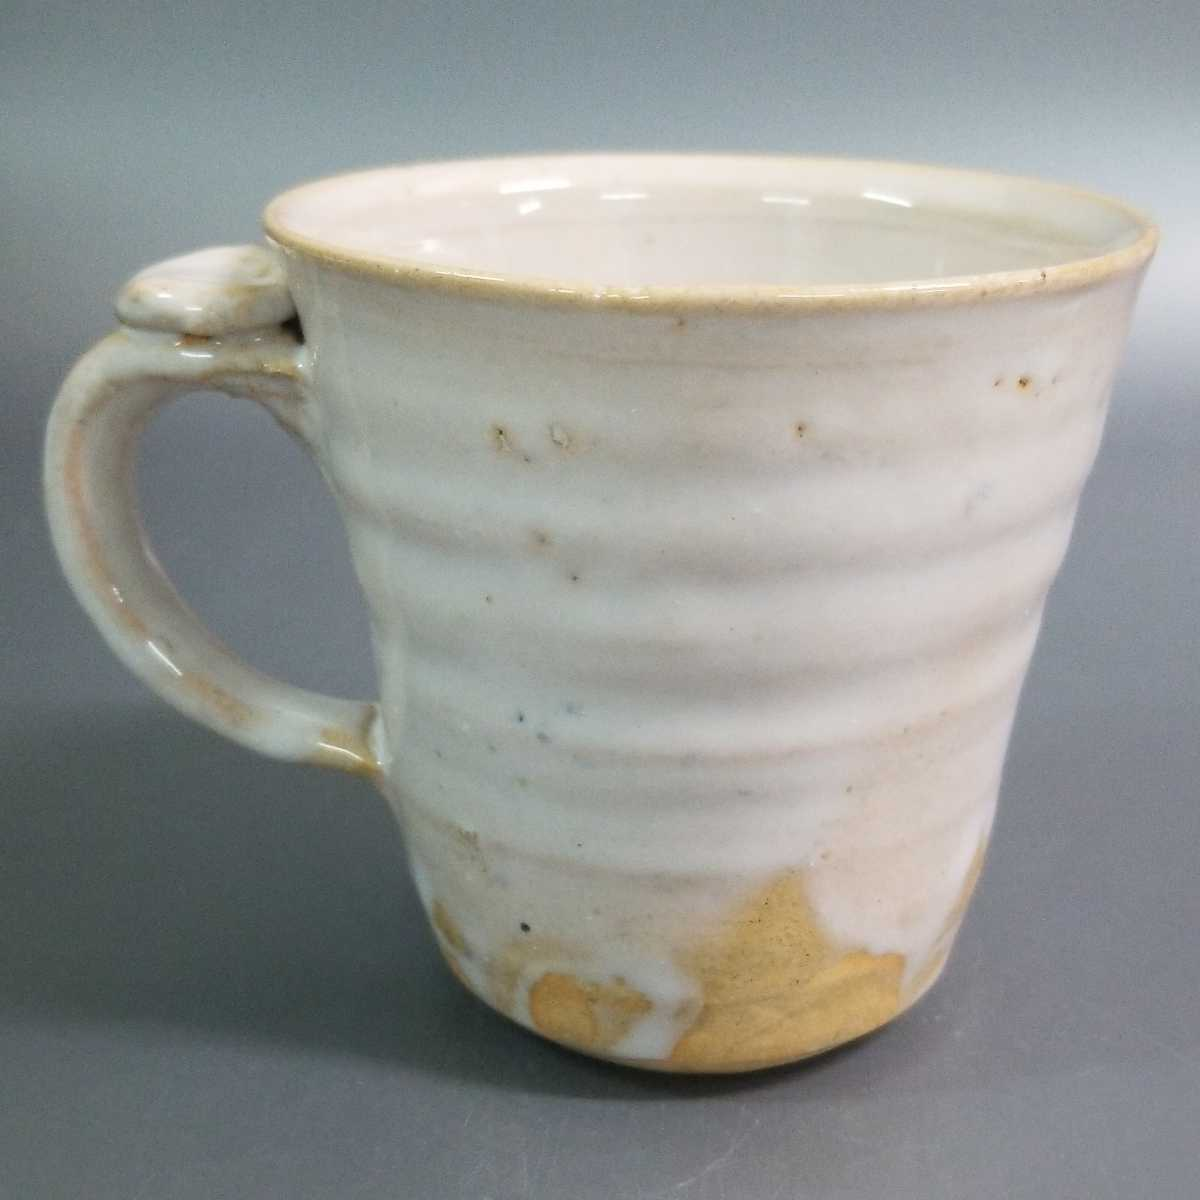 賜67)萩焼 渋谷泥詩 白萩マグカップ 珈琲器 茶器 未使用新品 同梱歓迎 _画像4